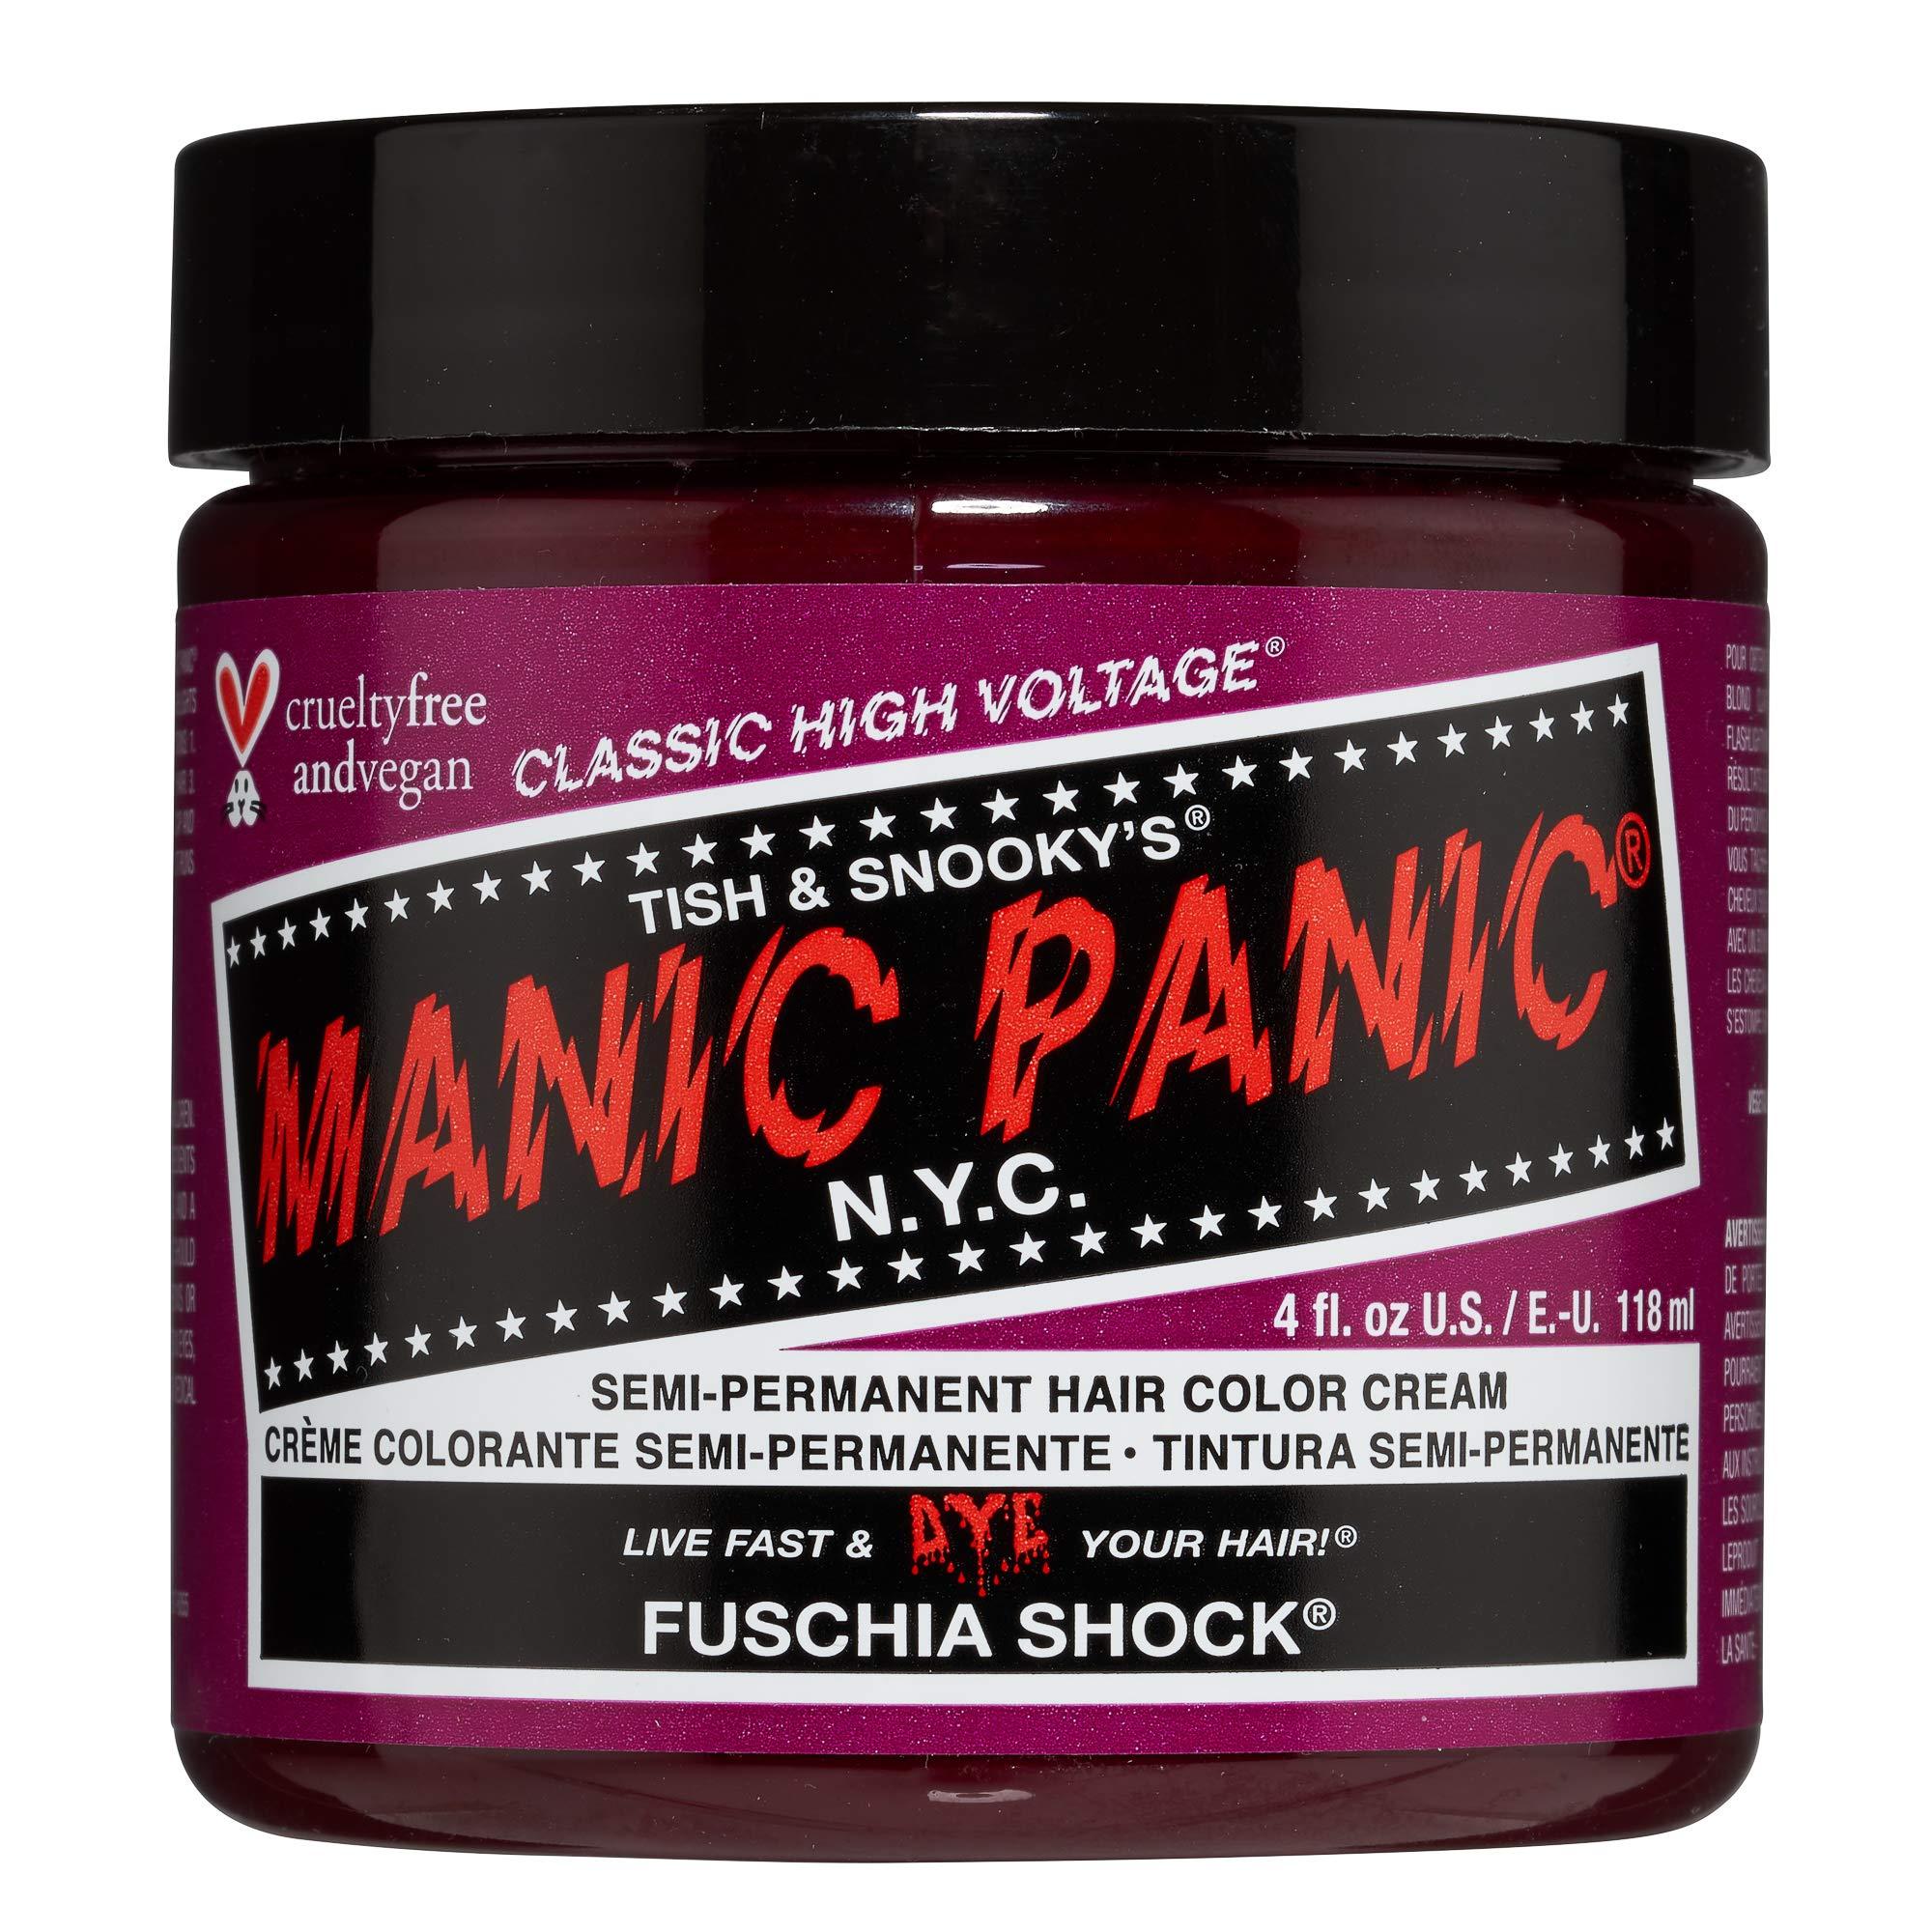 Manic Panic Fuschia Shock Hair Dye Classic                Manic Panic Voodoo Blue Hair Dye Classic                Manic Panic Flash Lightning Hair Bleach Kit 30 Vol                Manic Panic Hot Hot Pink Hair Color - Amplified                Manic Panic Psychedelic Sunset Orange Hair Dye